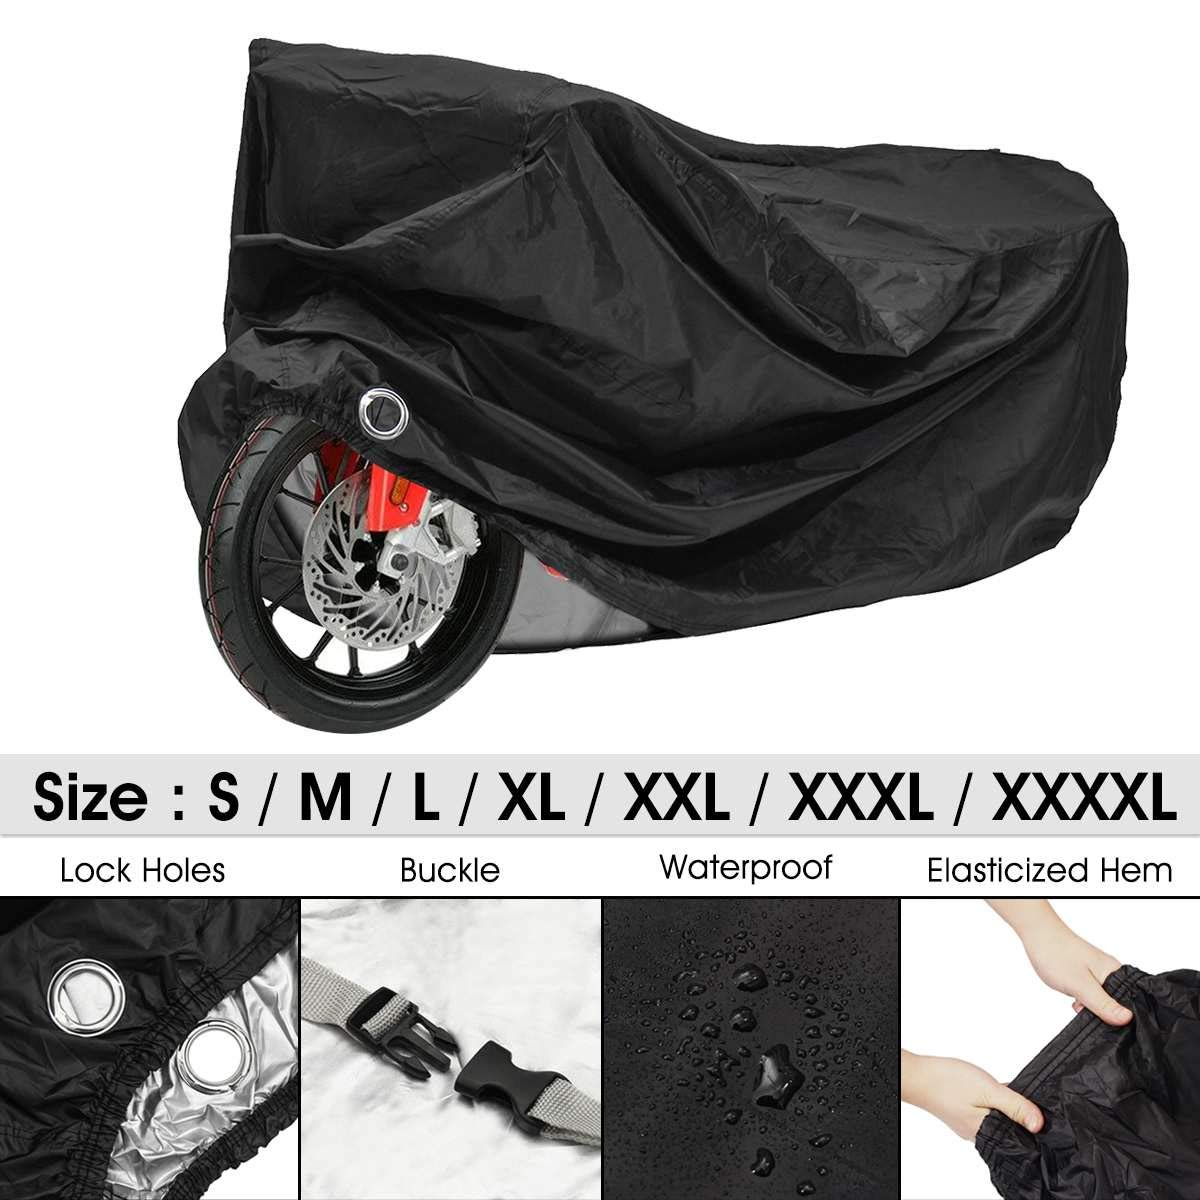 XXL Motorcycle Bike Scooter Cover Outdoor Waterproof Anti-Rain Snow Dust UV US